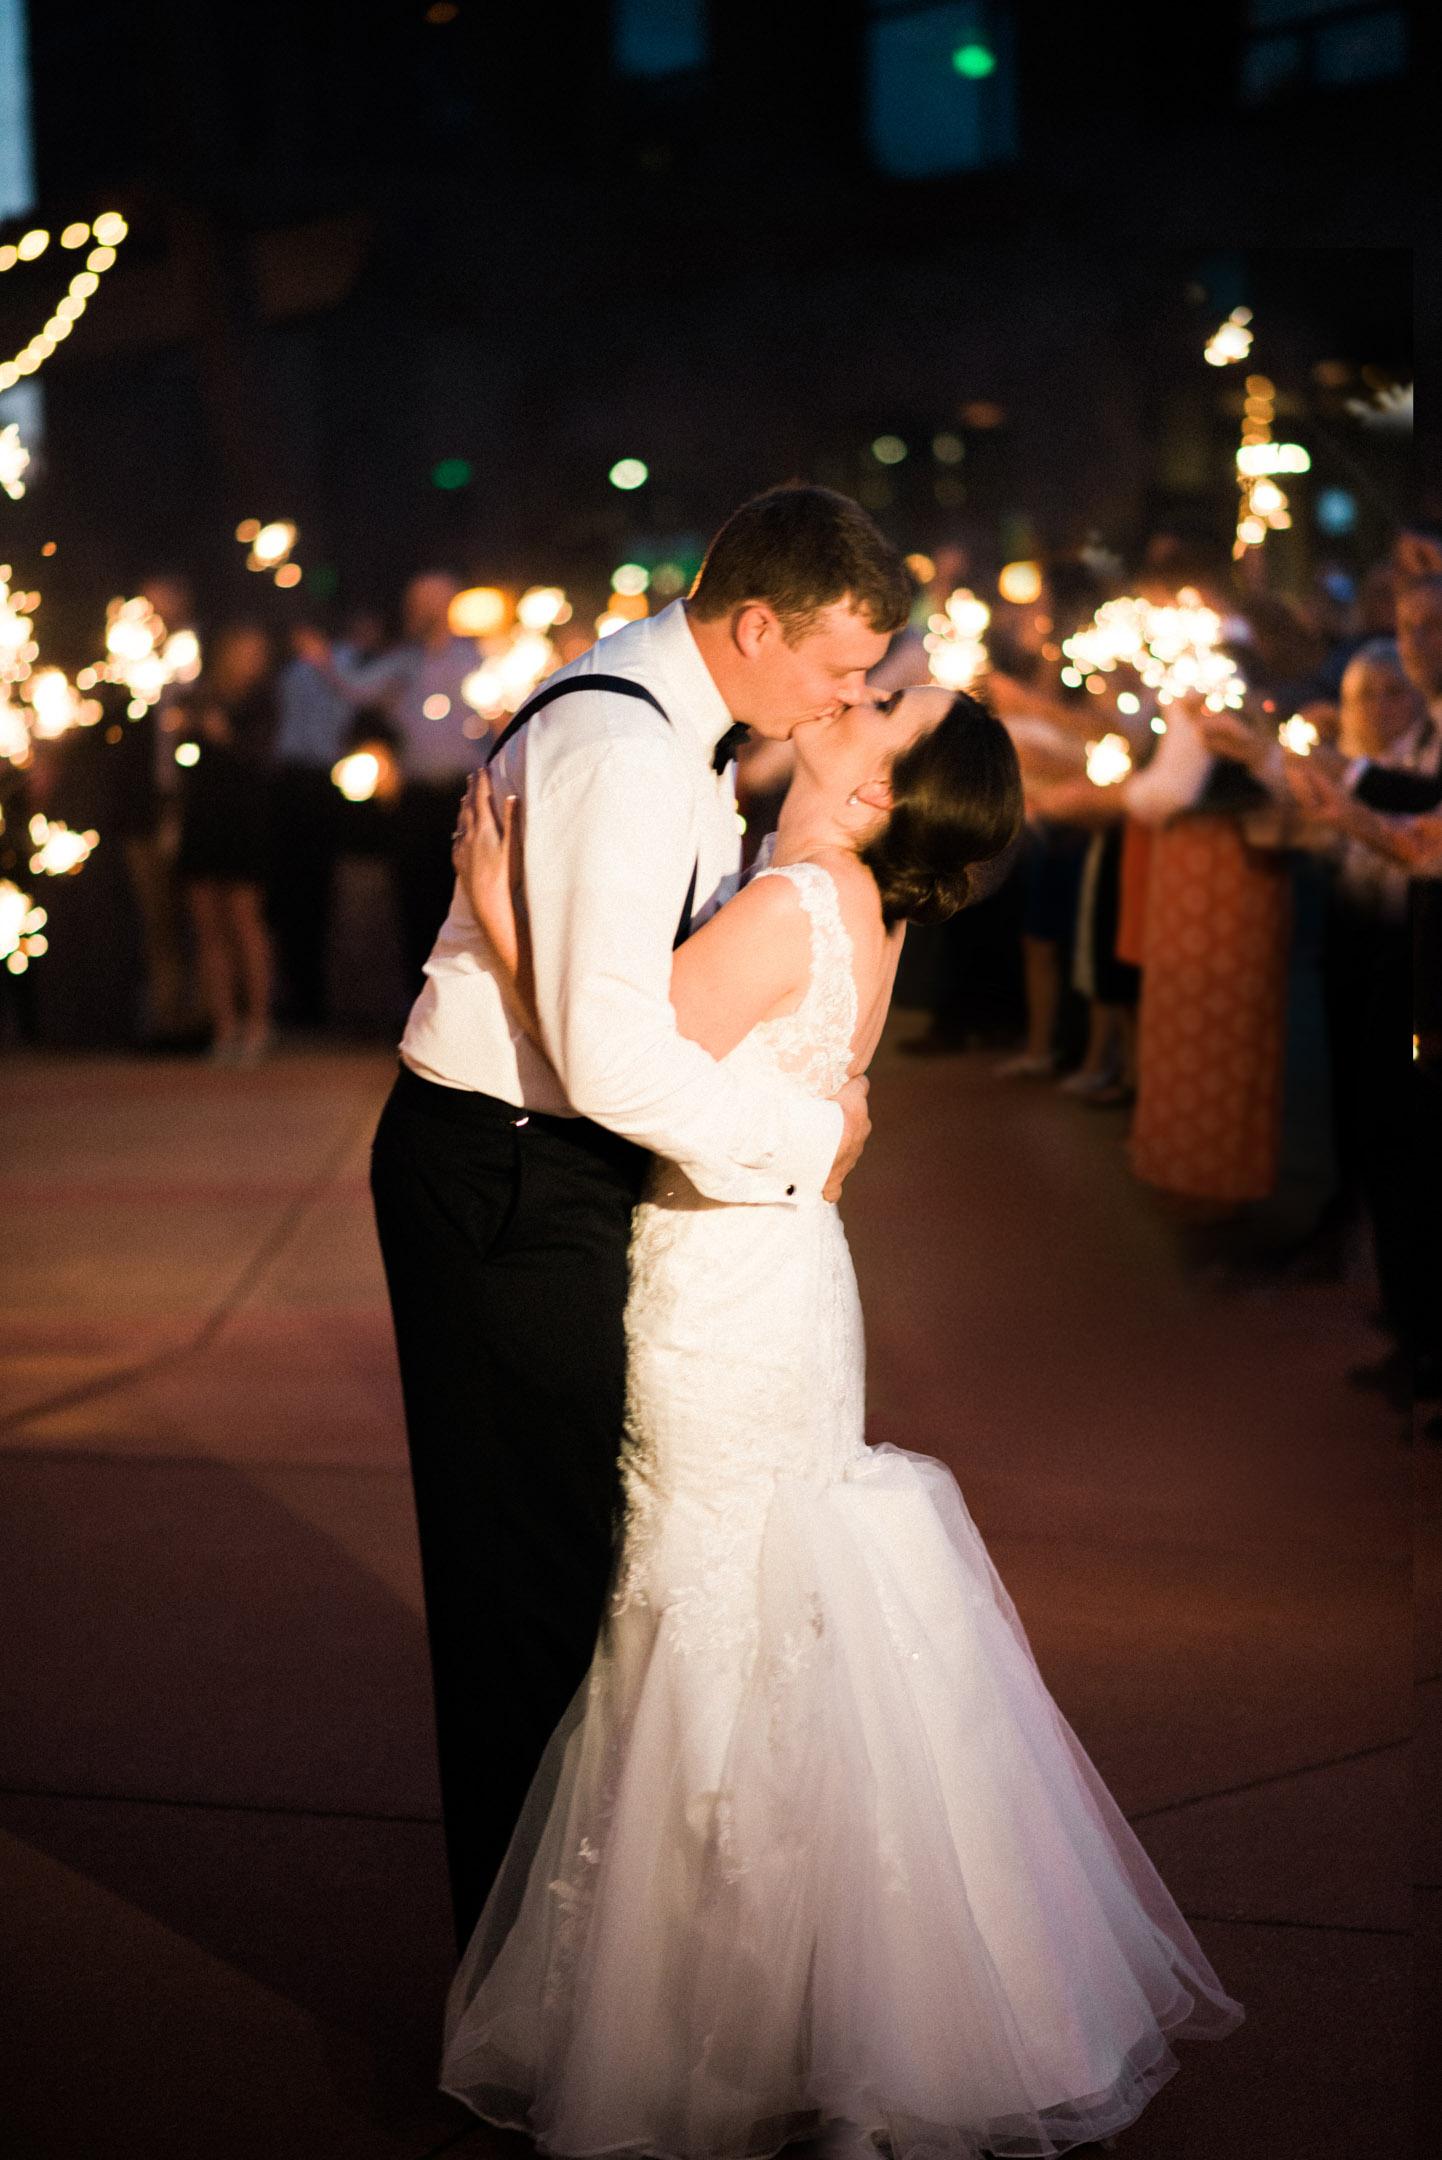 sentry world wedding sparkler exit